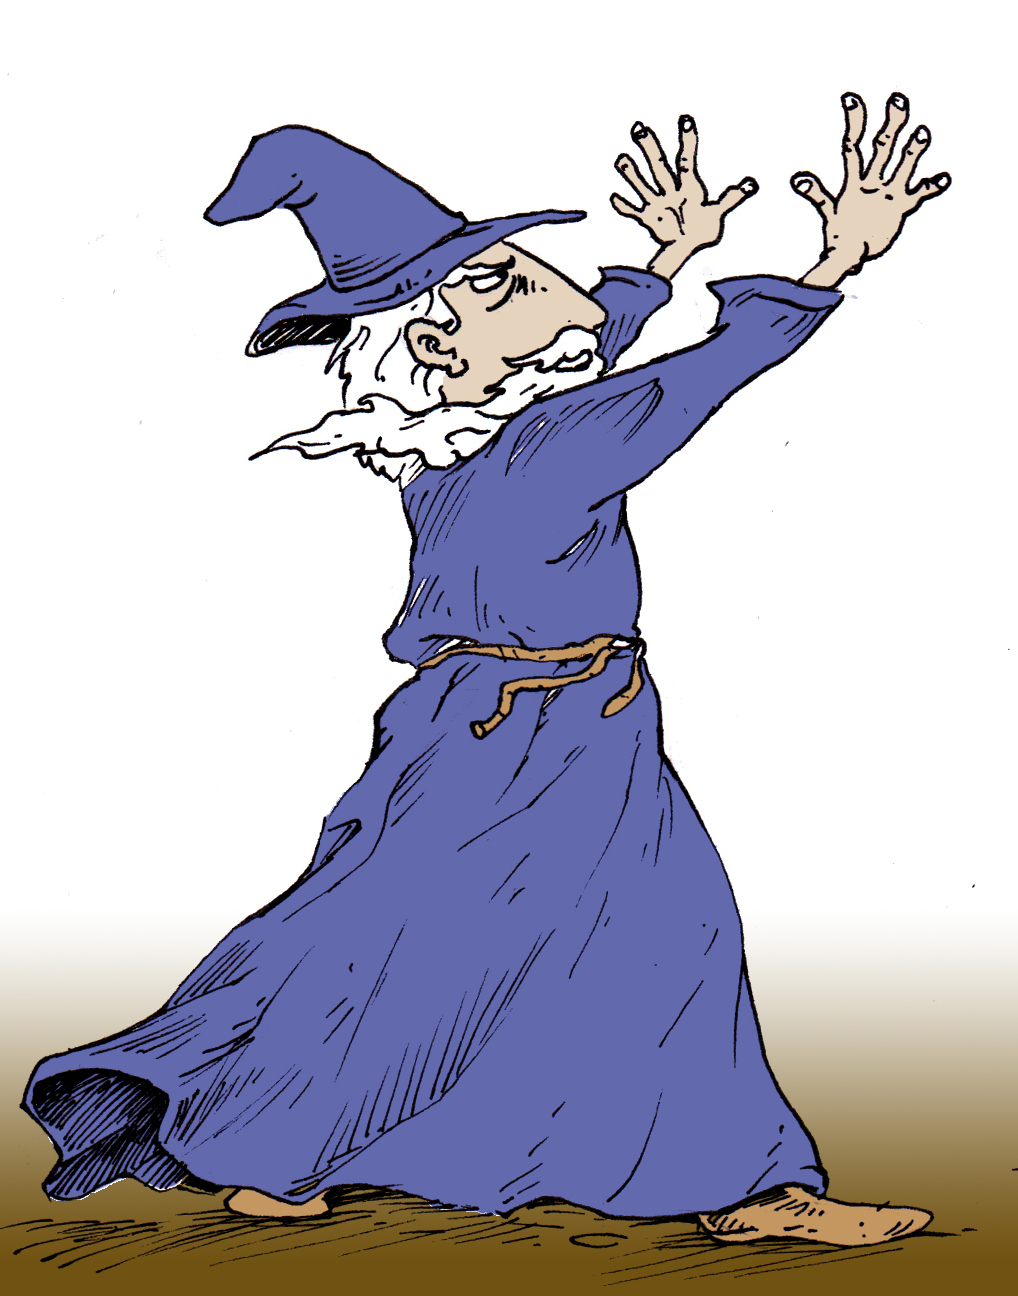 gandalf the mischiefmonger essay